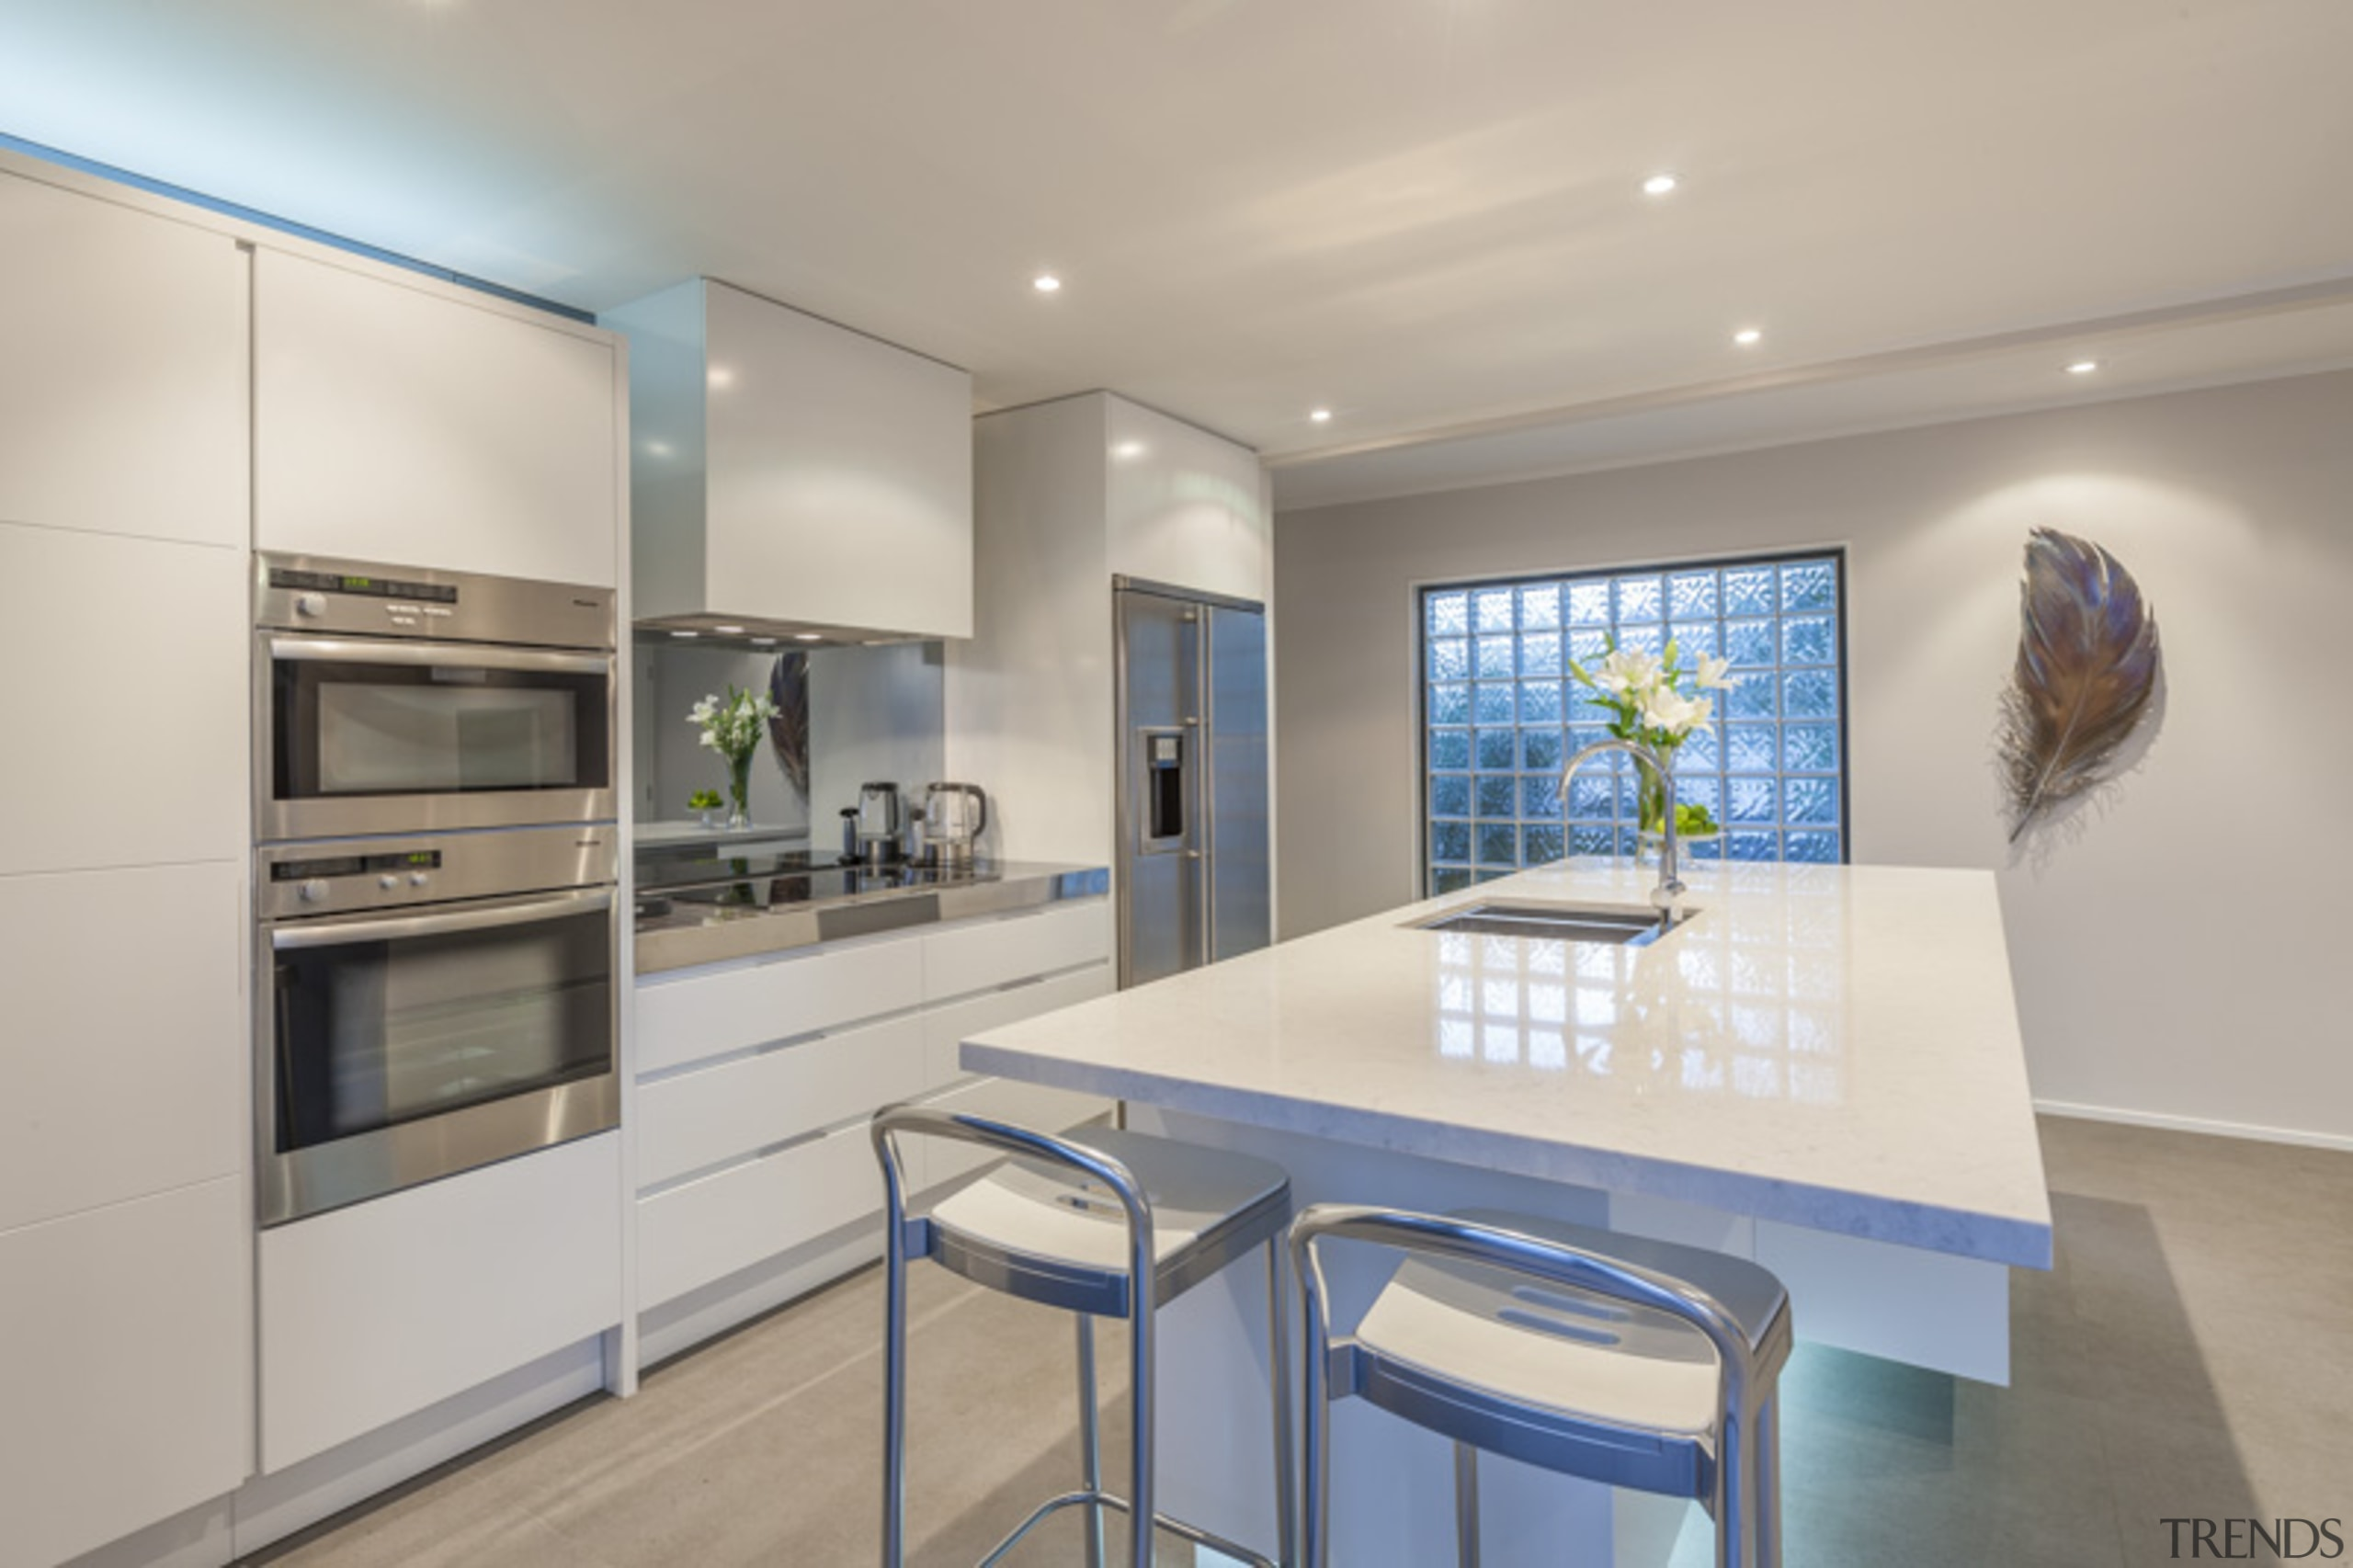 Cantilevered servery/benchtop for eating - countertop   interior countertop, interior design, kitchen, real estate, gray